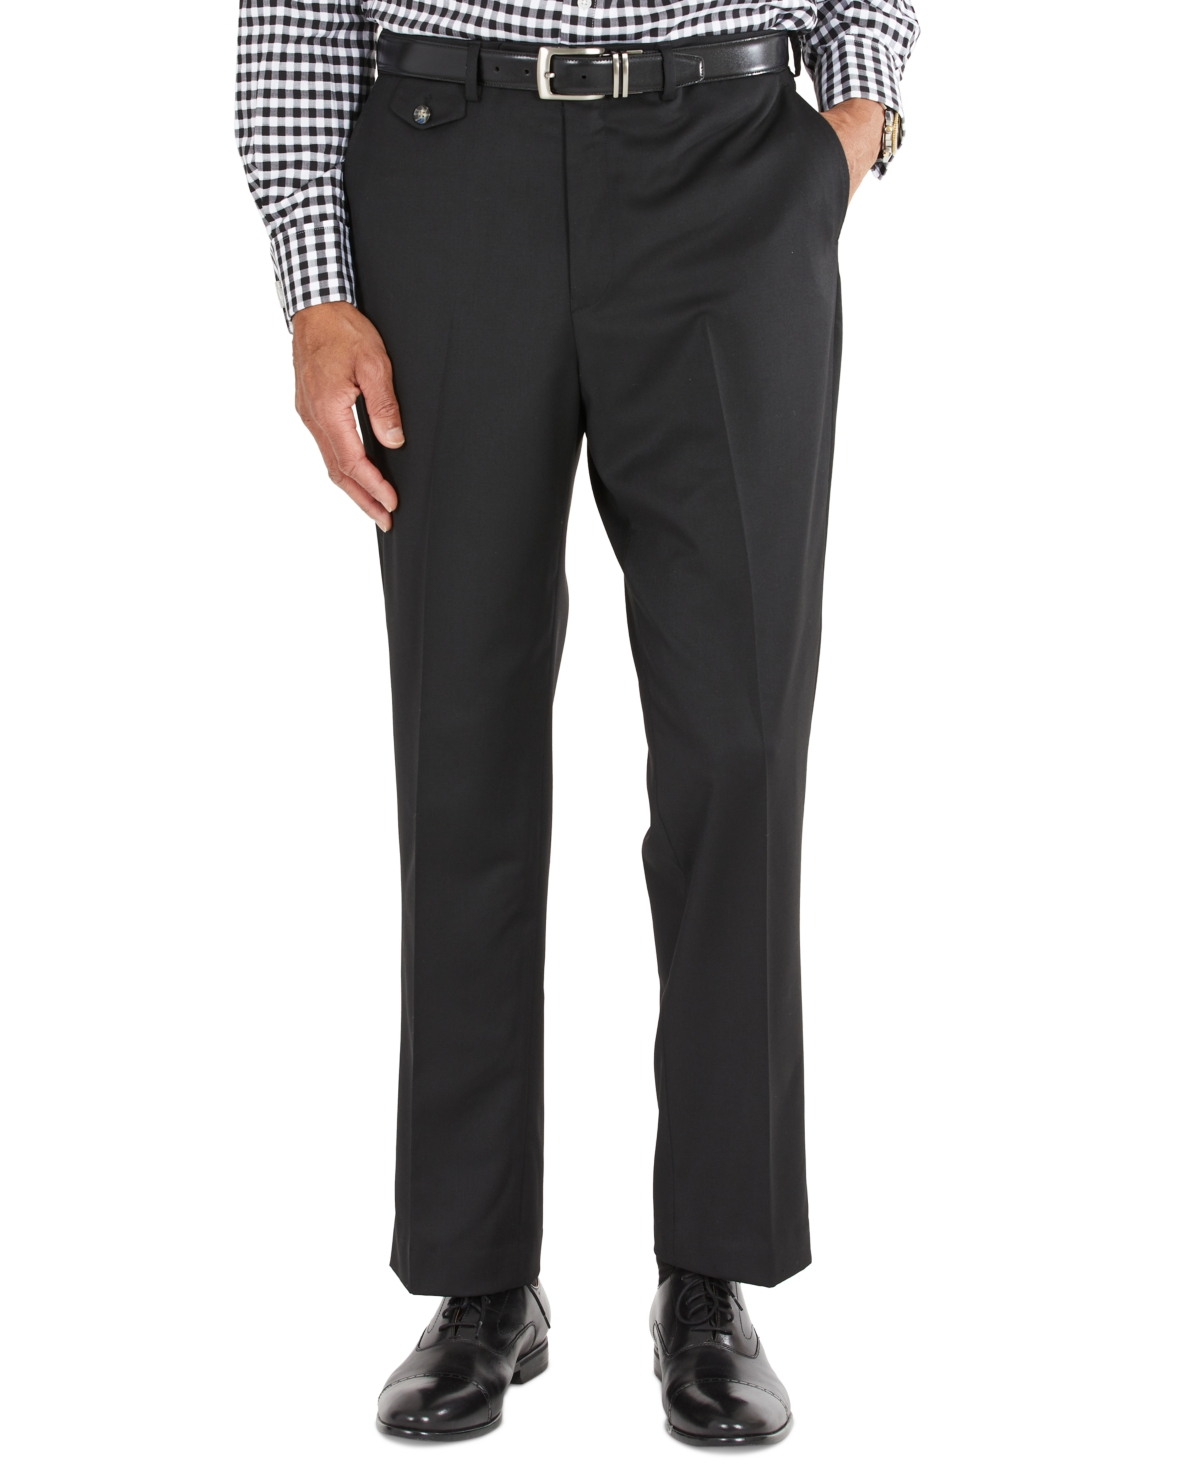 1960s Men's Clothing Tayion Collection Mens Classic-Fit Solid Black Suit Separates Pants $175.00 AT vintagedancer.com